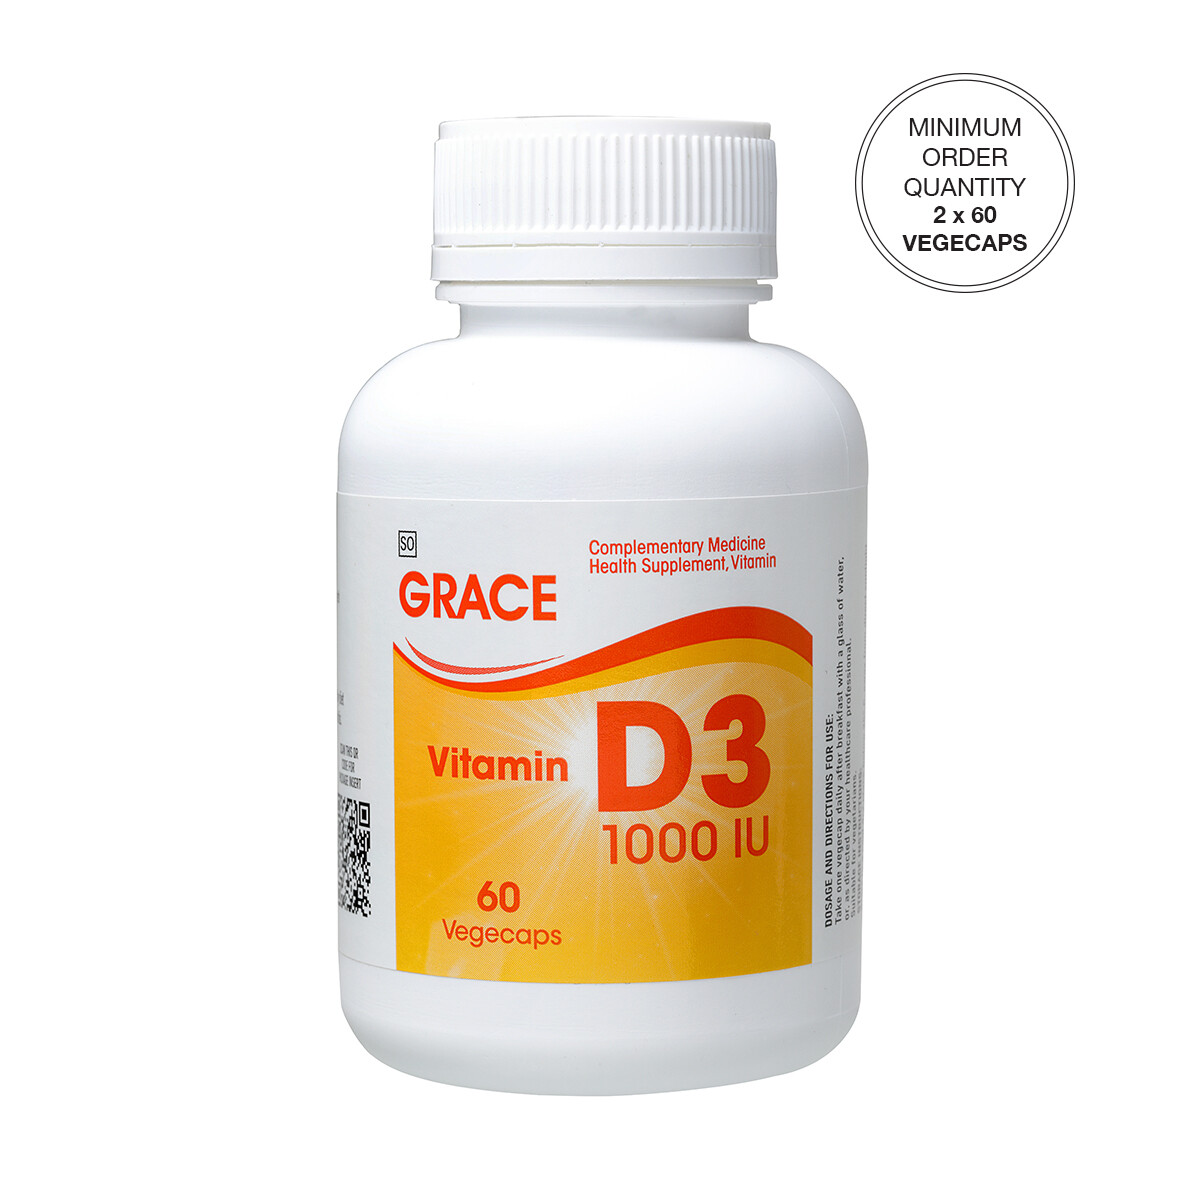 GRACE Vitamin D3 Vegecaps [Min. order 2 x 60's]